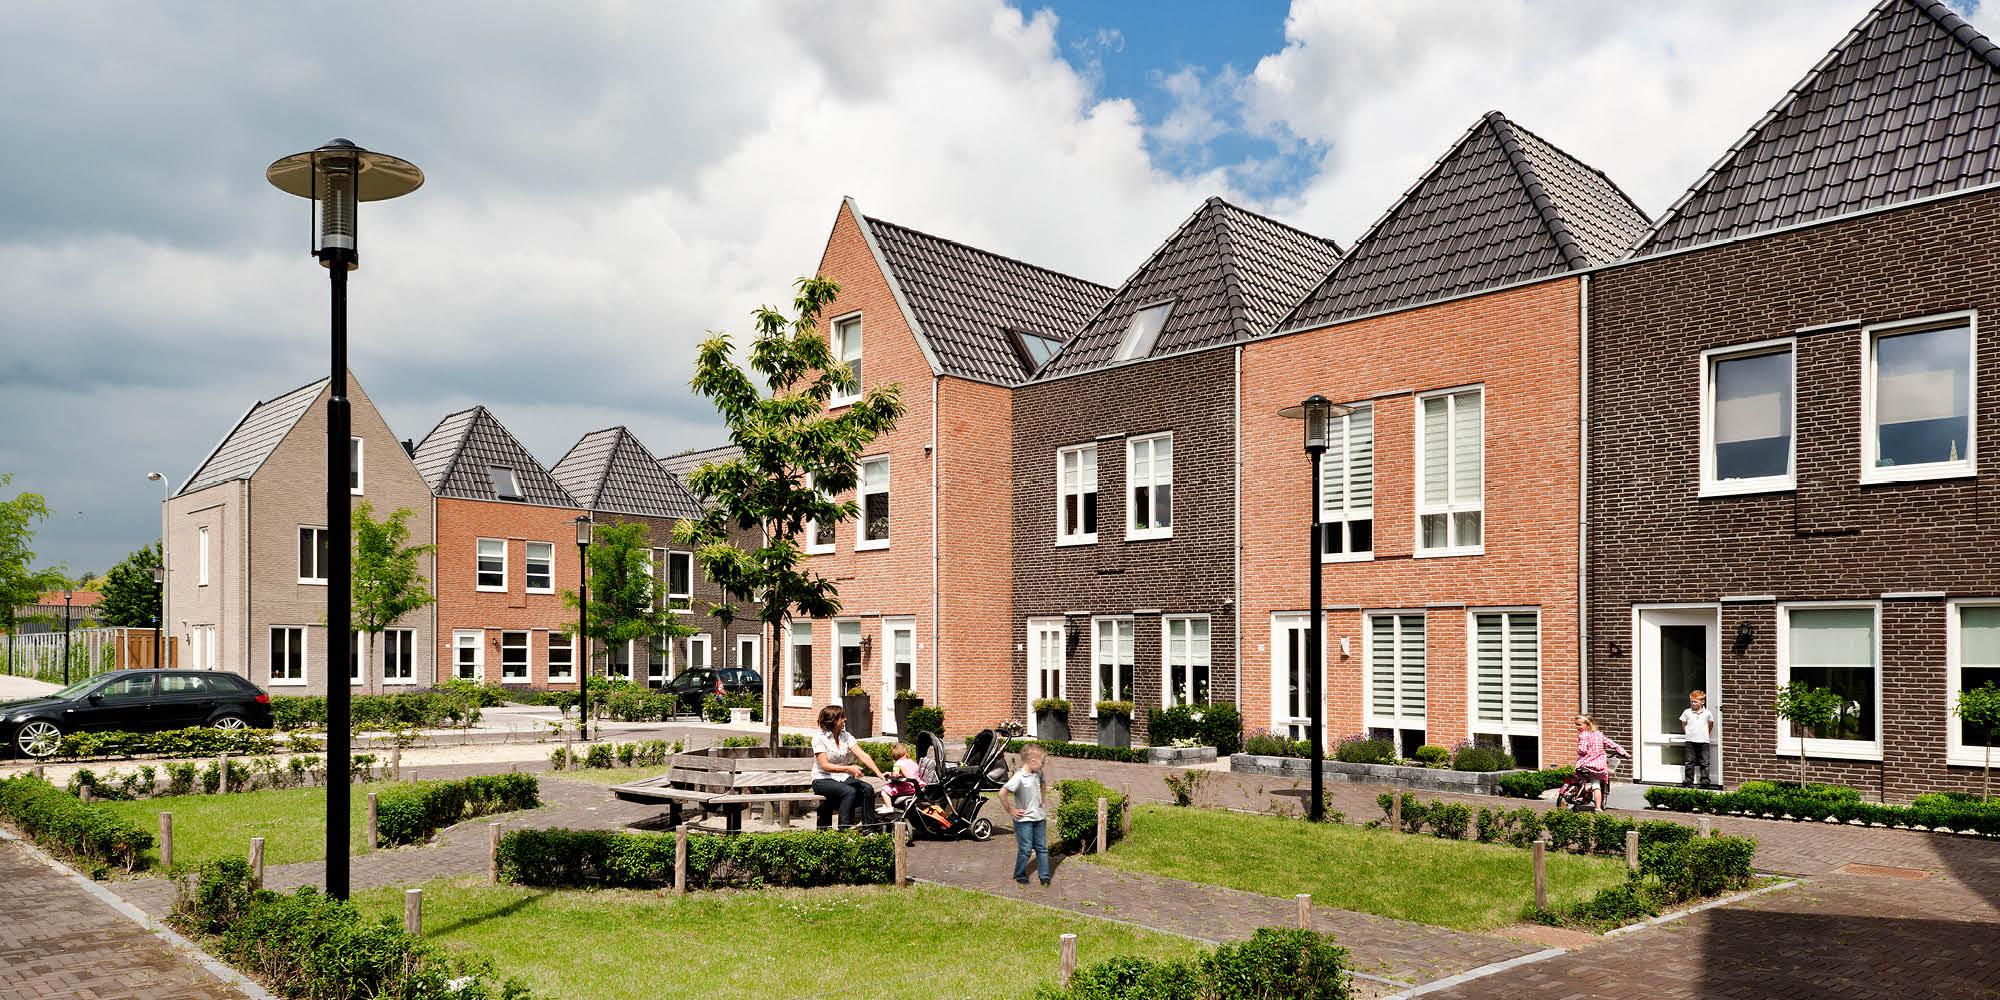 151-Leesonhof-Ederveen5